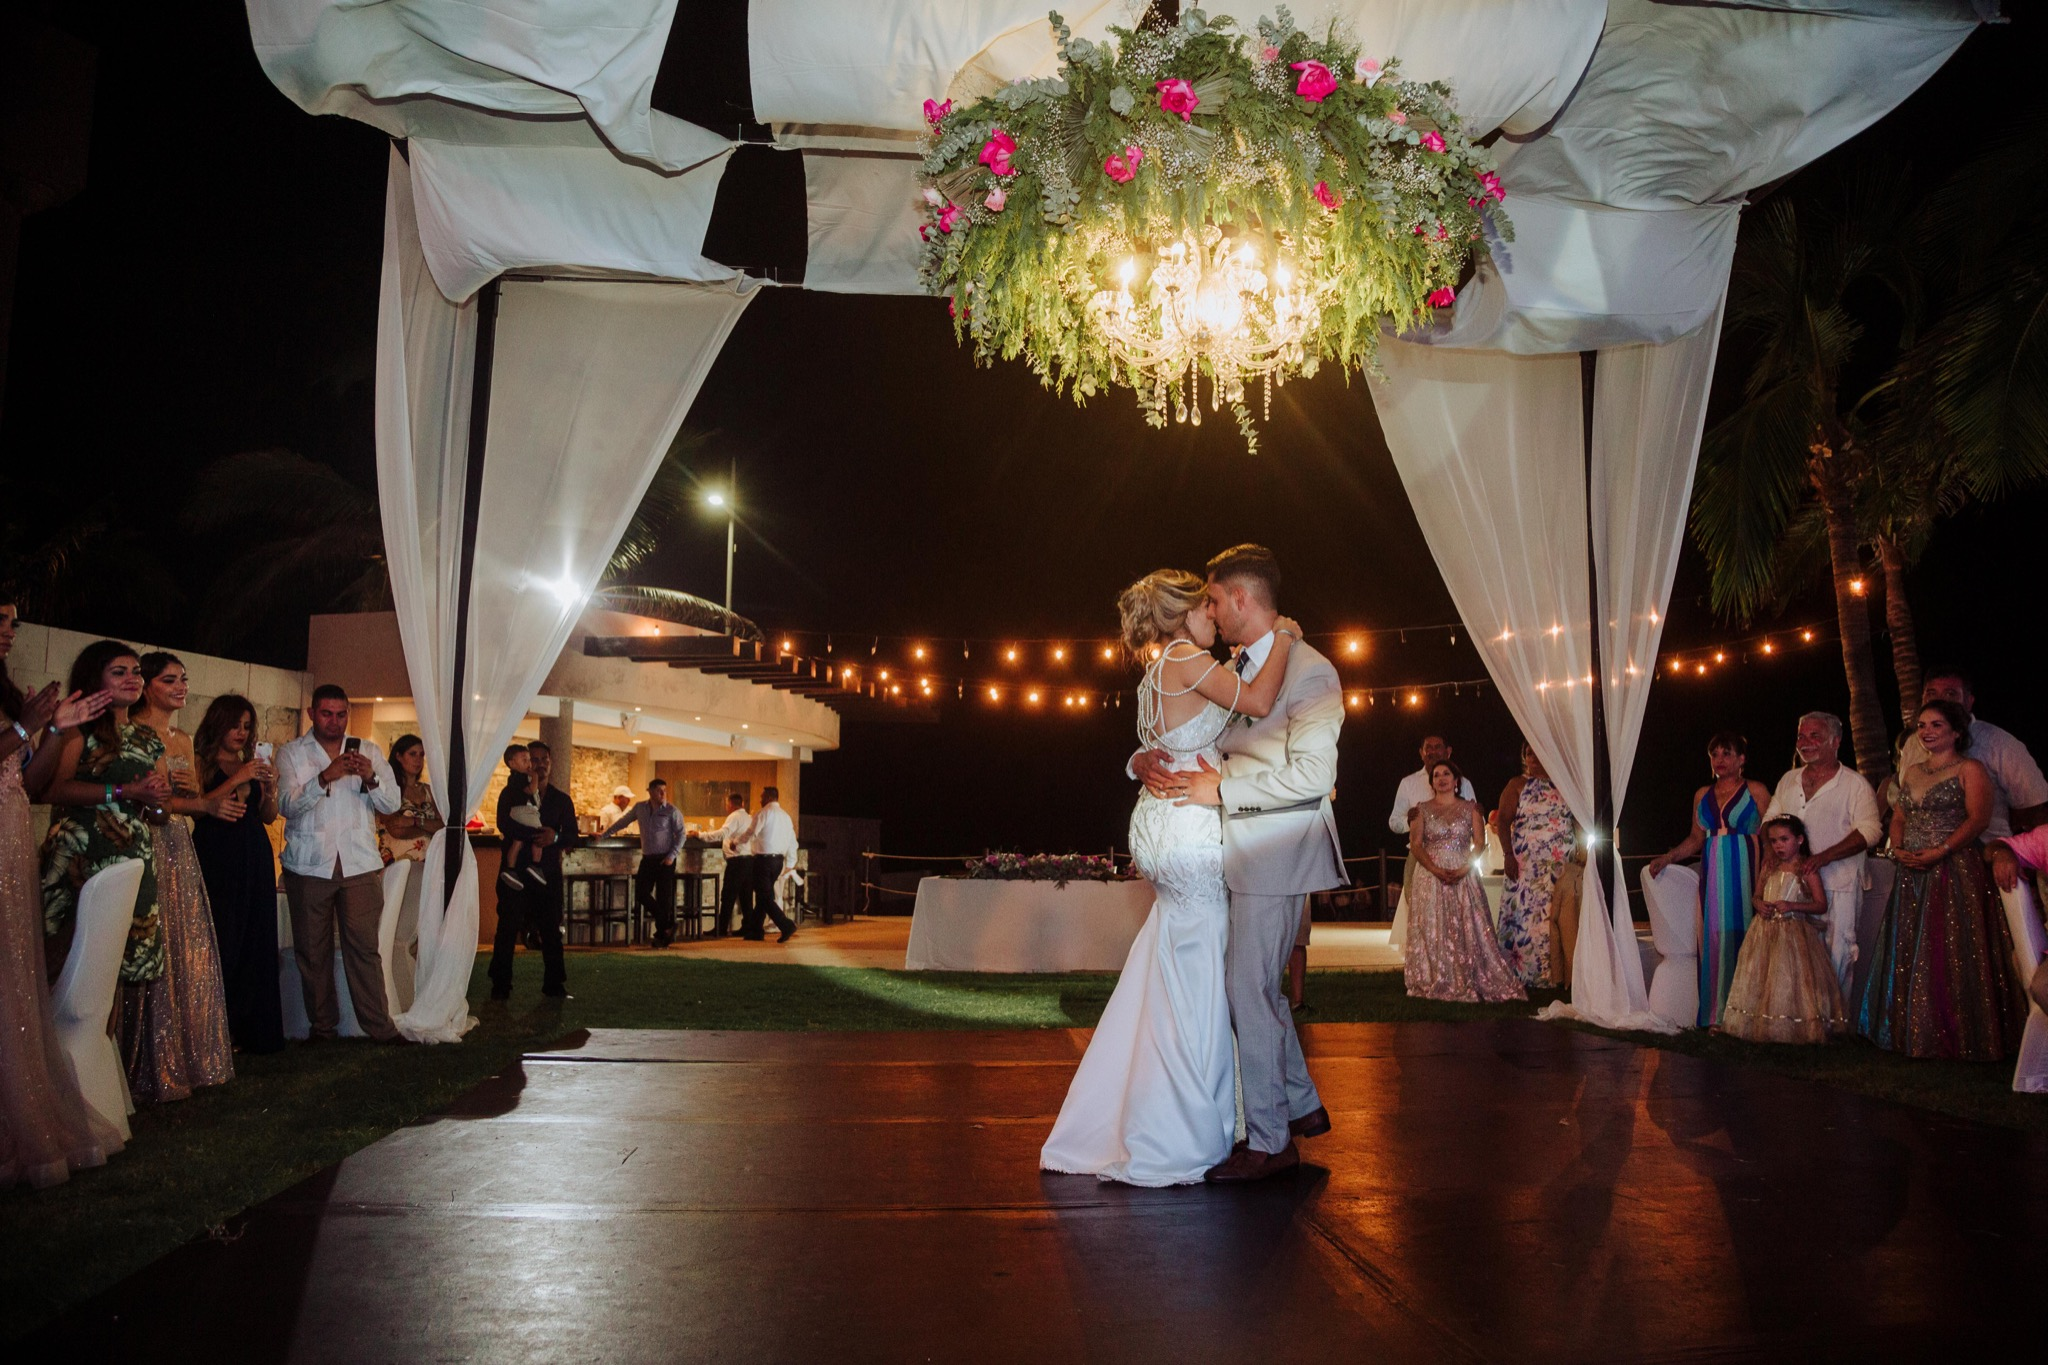 Javier_noriega_fotografo_bodas_profesional_zacatecas_mexico_mazatlan_sinaloa_photographer_weddings70